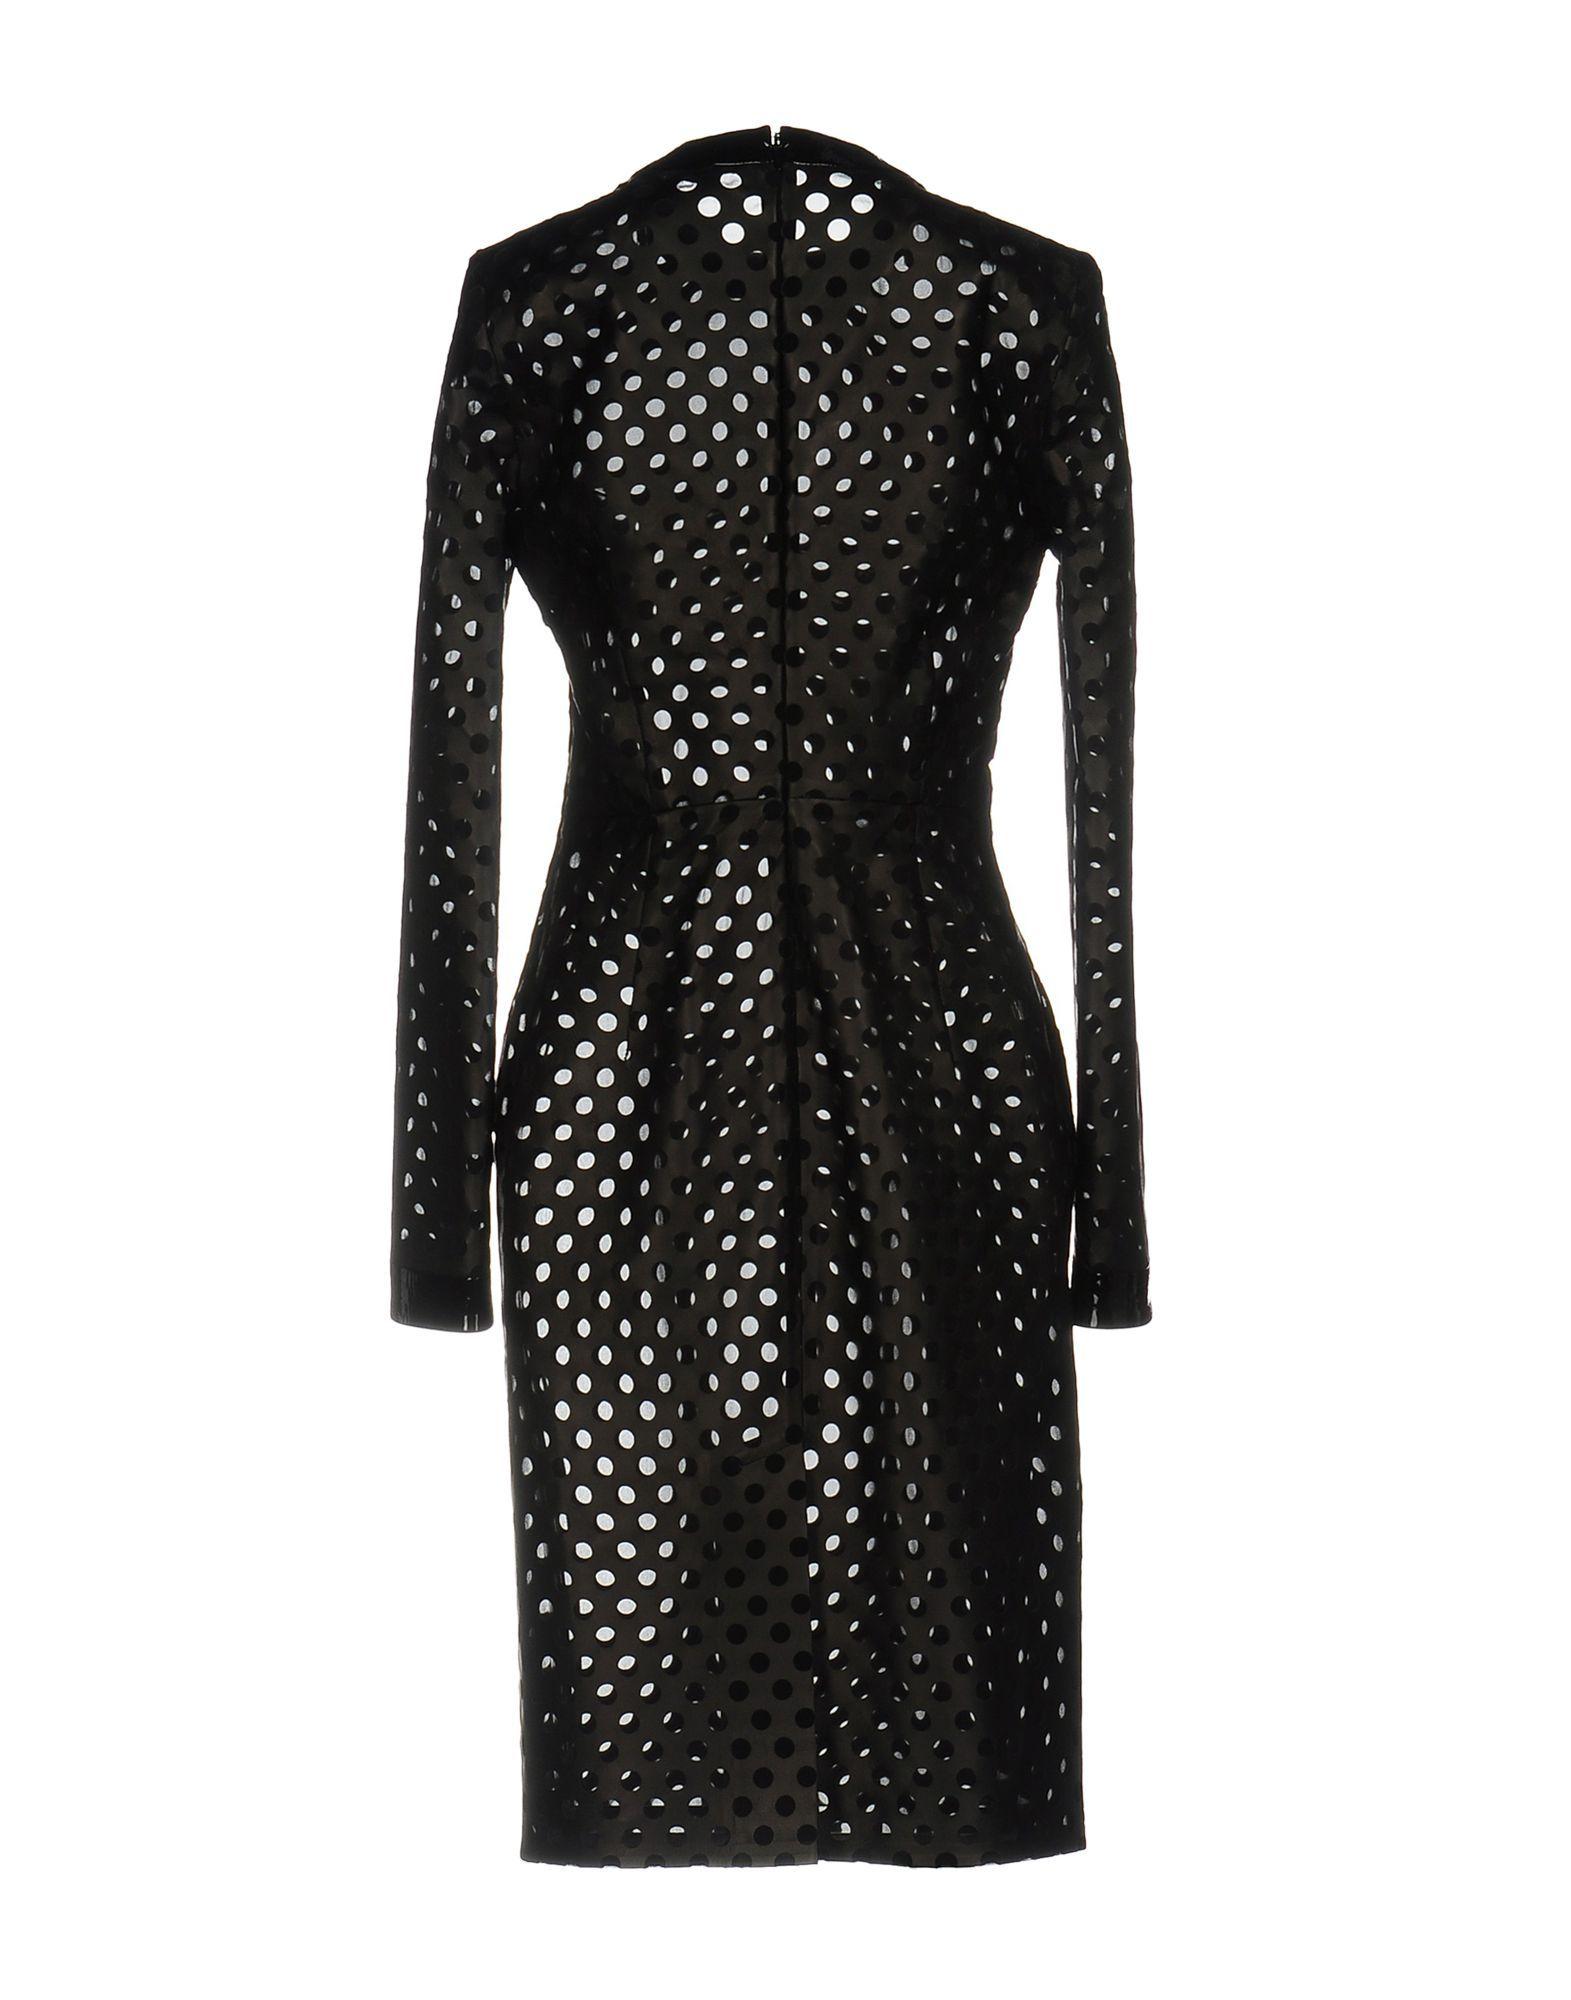 Tom Ford Black Lambskin Leather Long Sleeve Dress